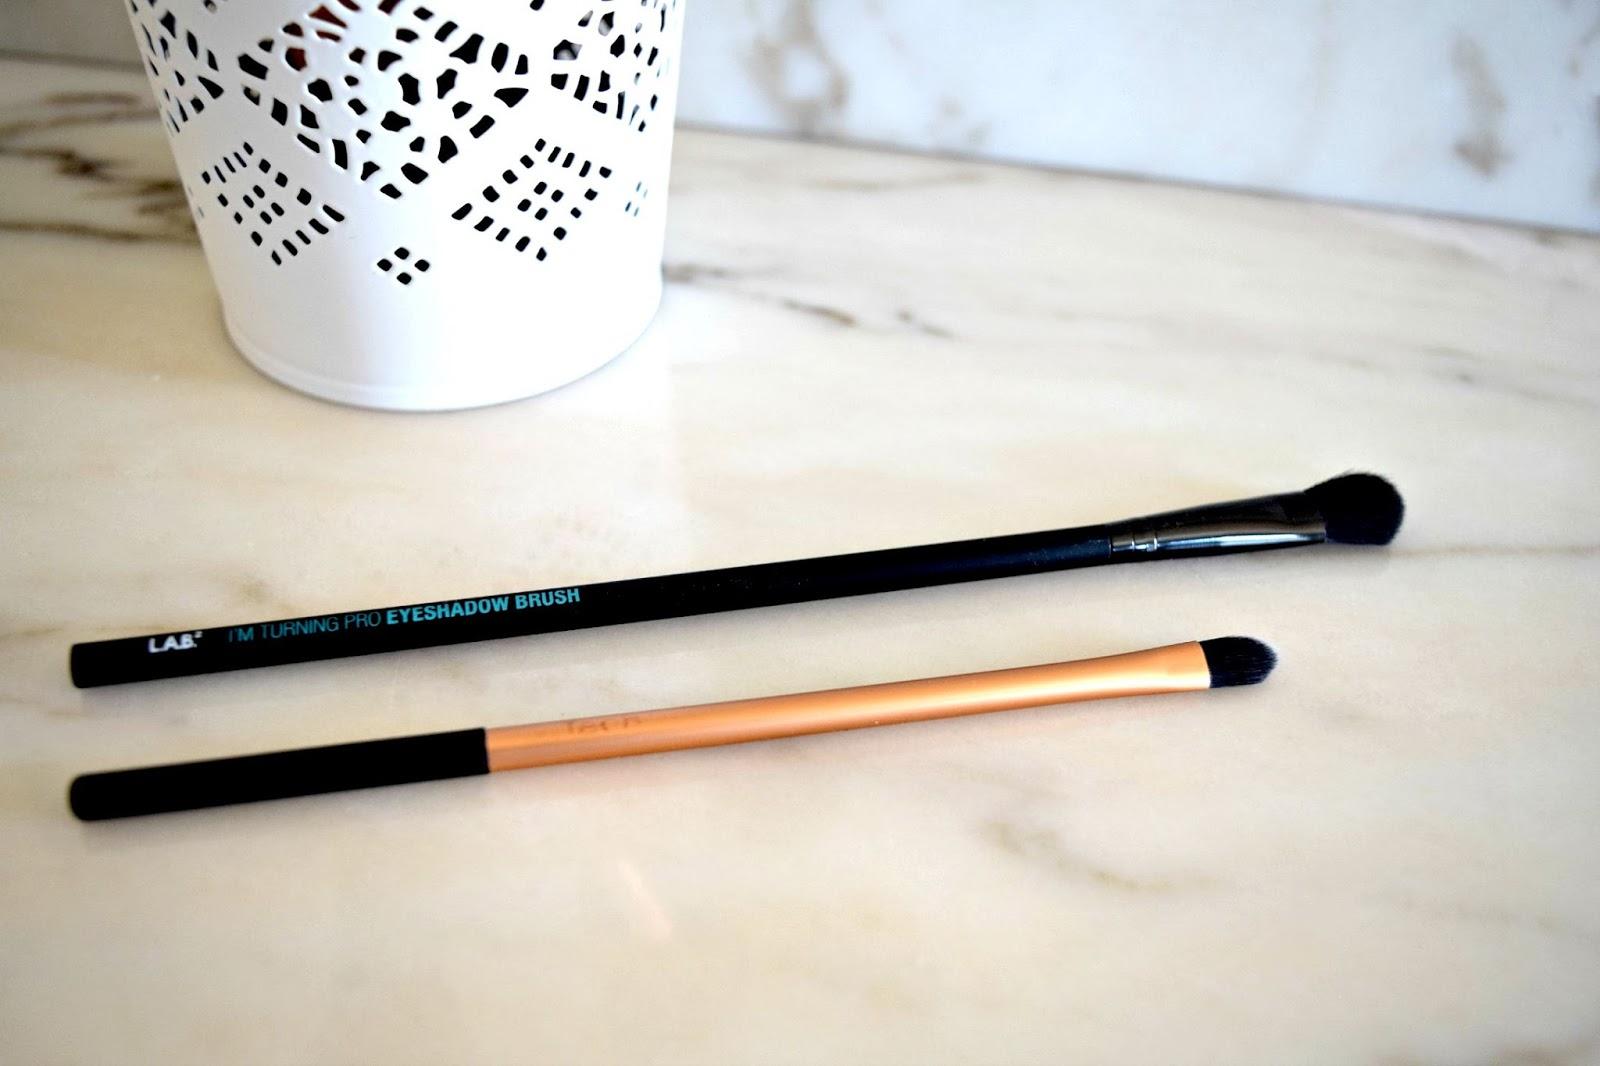 Eyeshadow Brush LAB 2